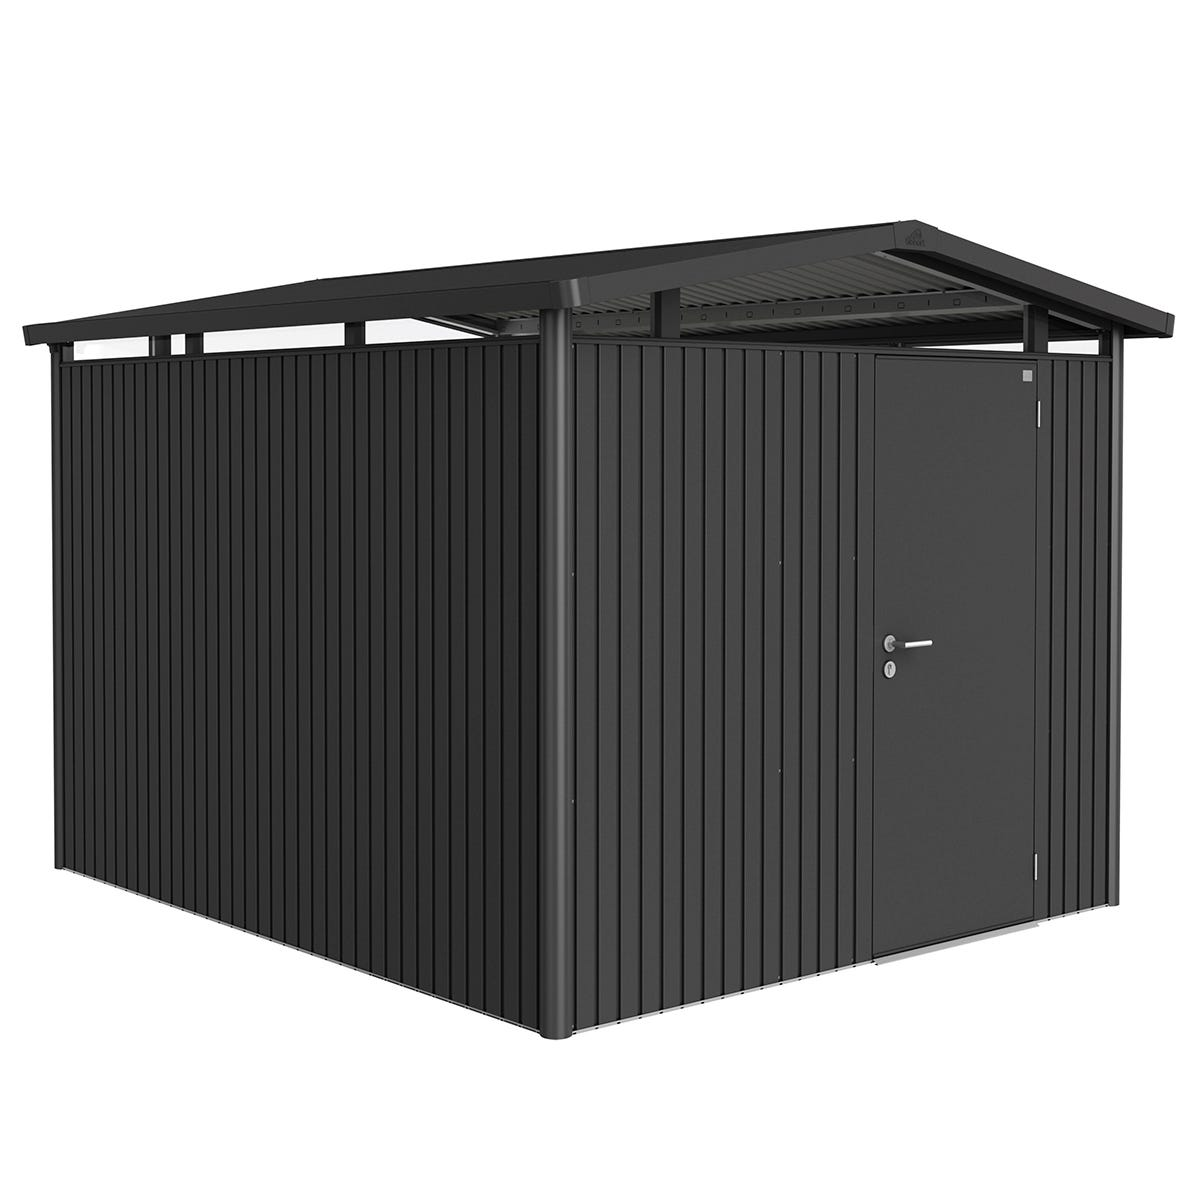 Biohort Panorama Metal Shed P5 Standard Door 9' x 10'' - Dark Grey